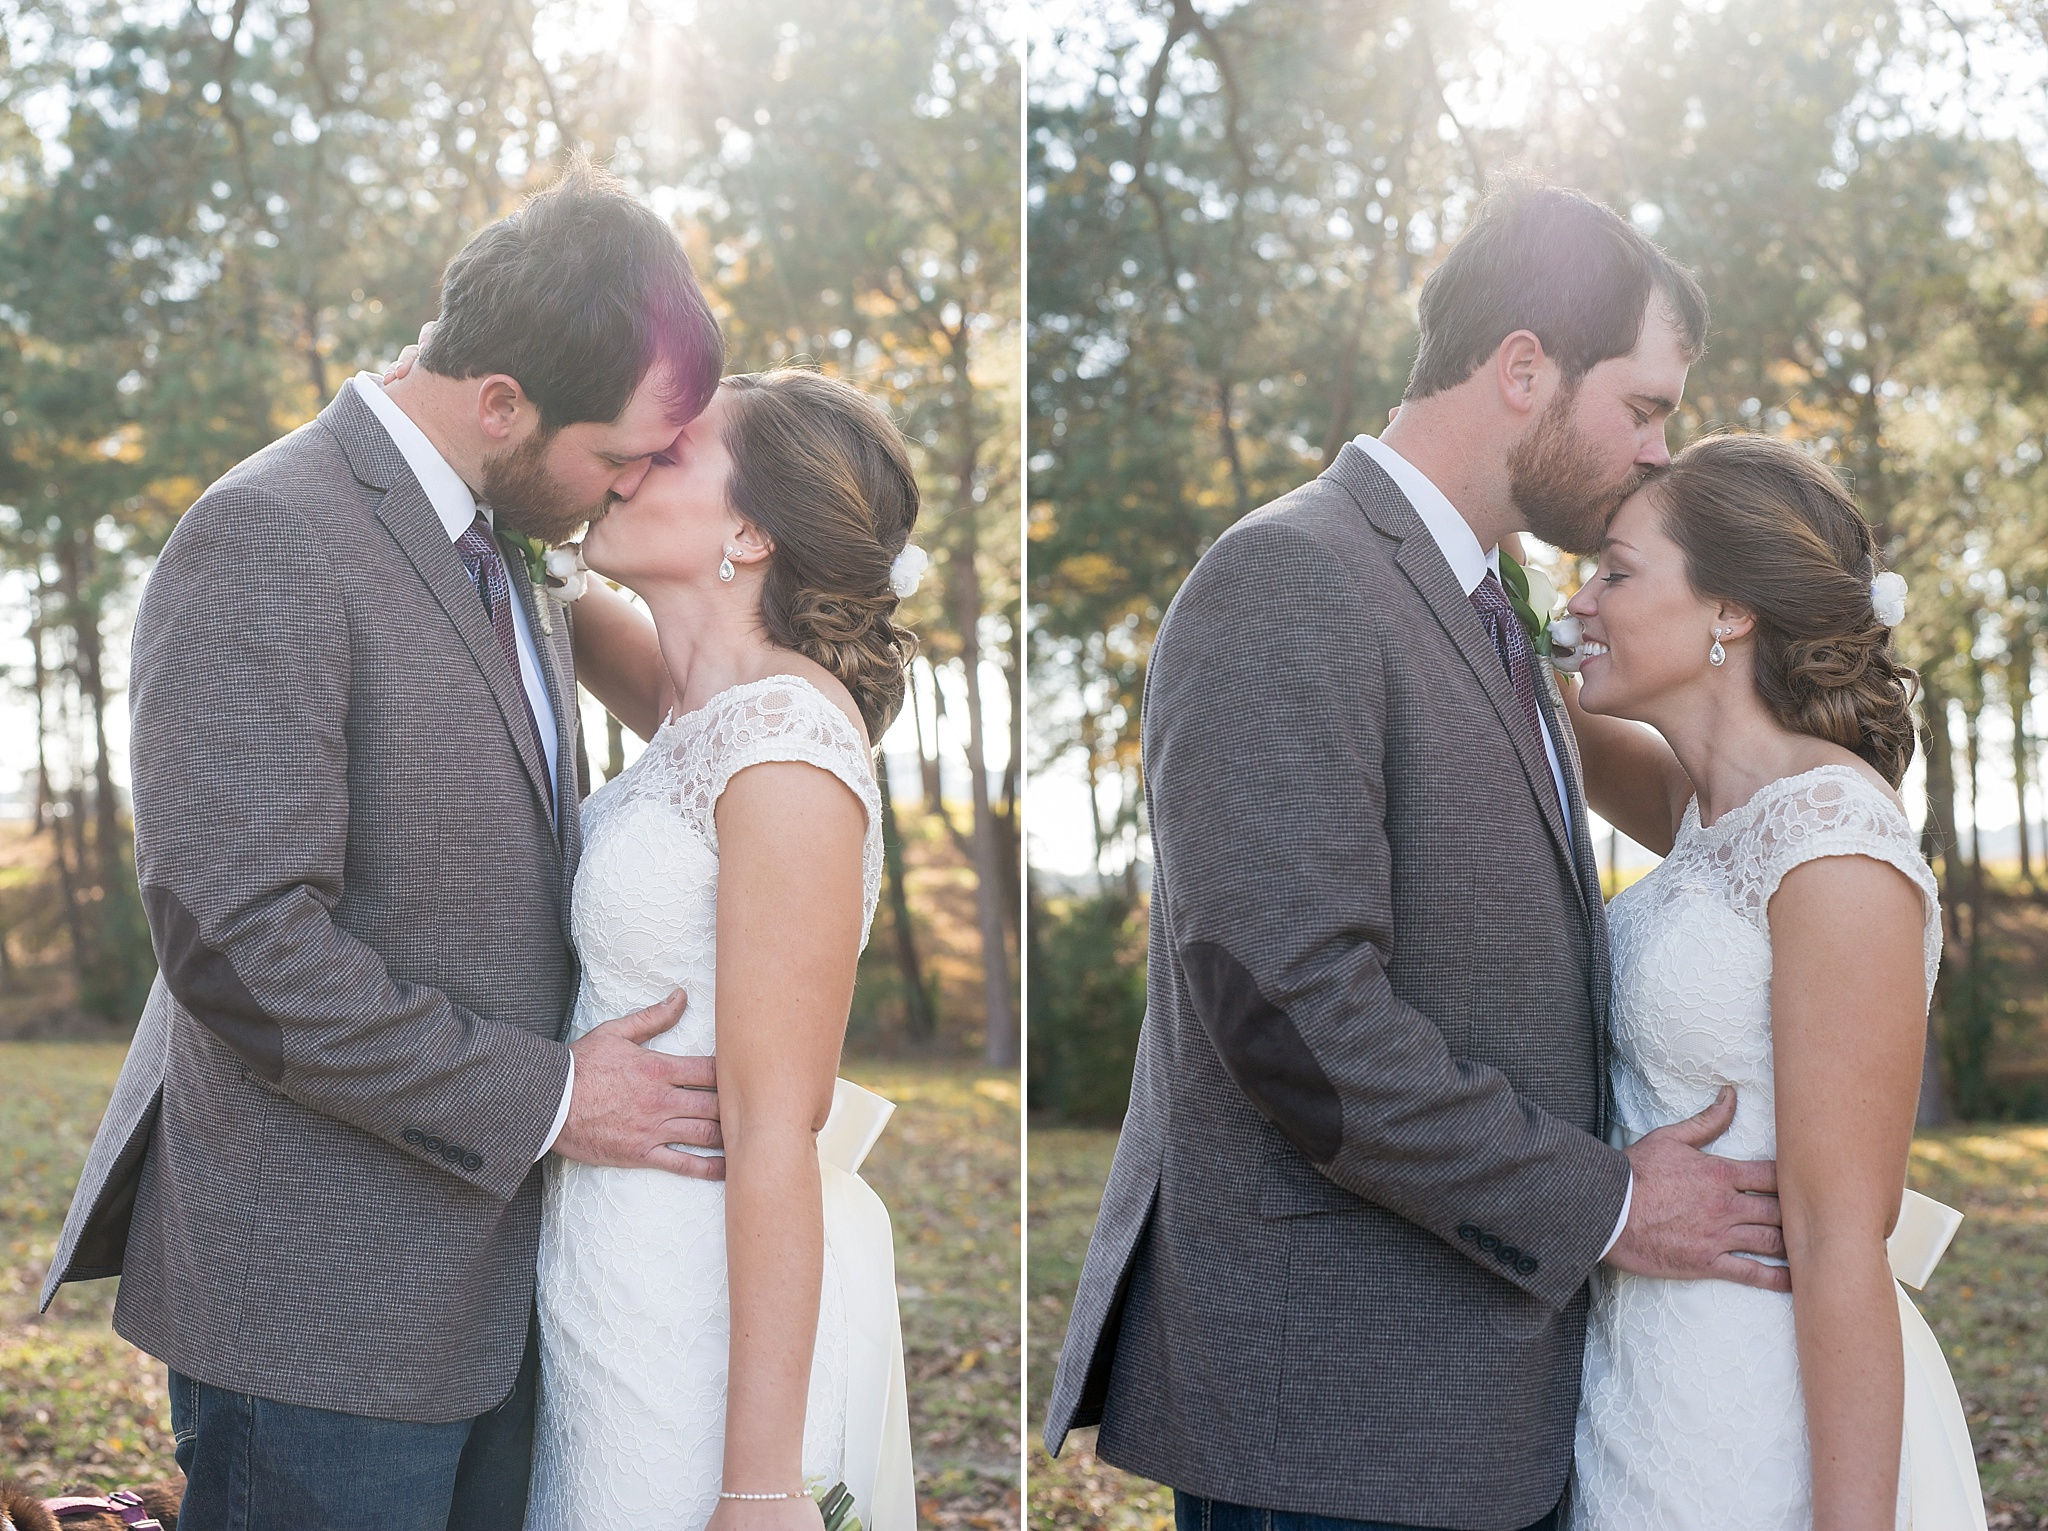 May-Lew-Farm-Farmville-NC-Wedding-Photographer-080.jpg